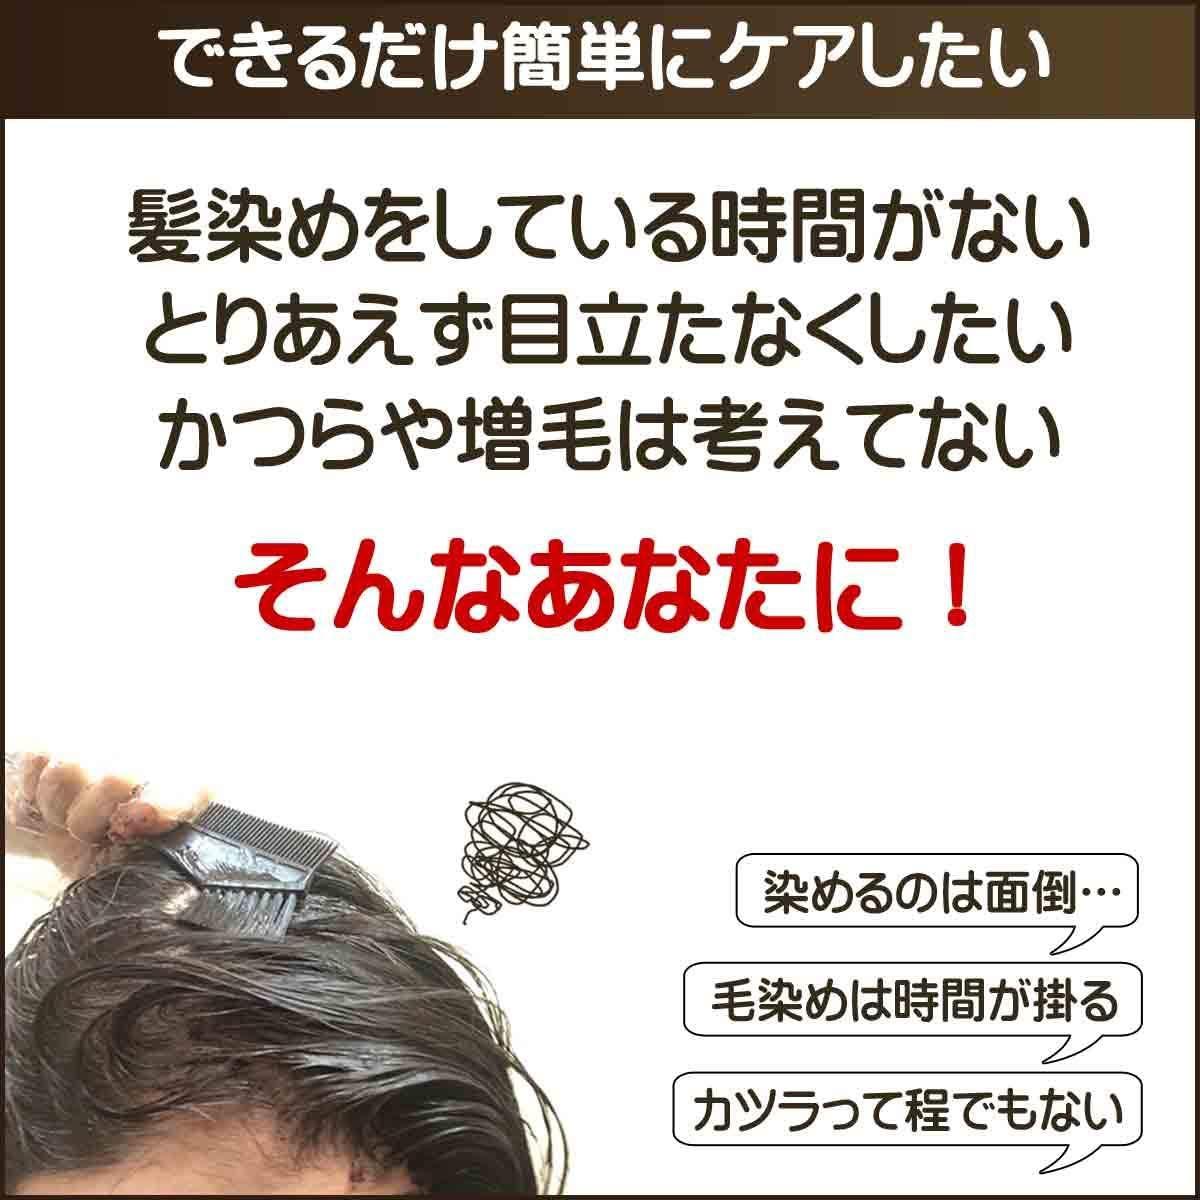 Alleygem(アリージェム) CONCIERGE 頭皮ファンデーションの商品画像4